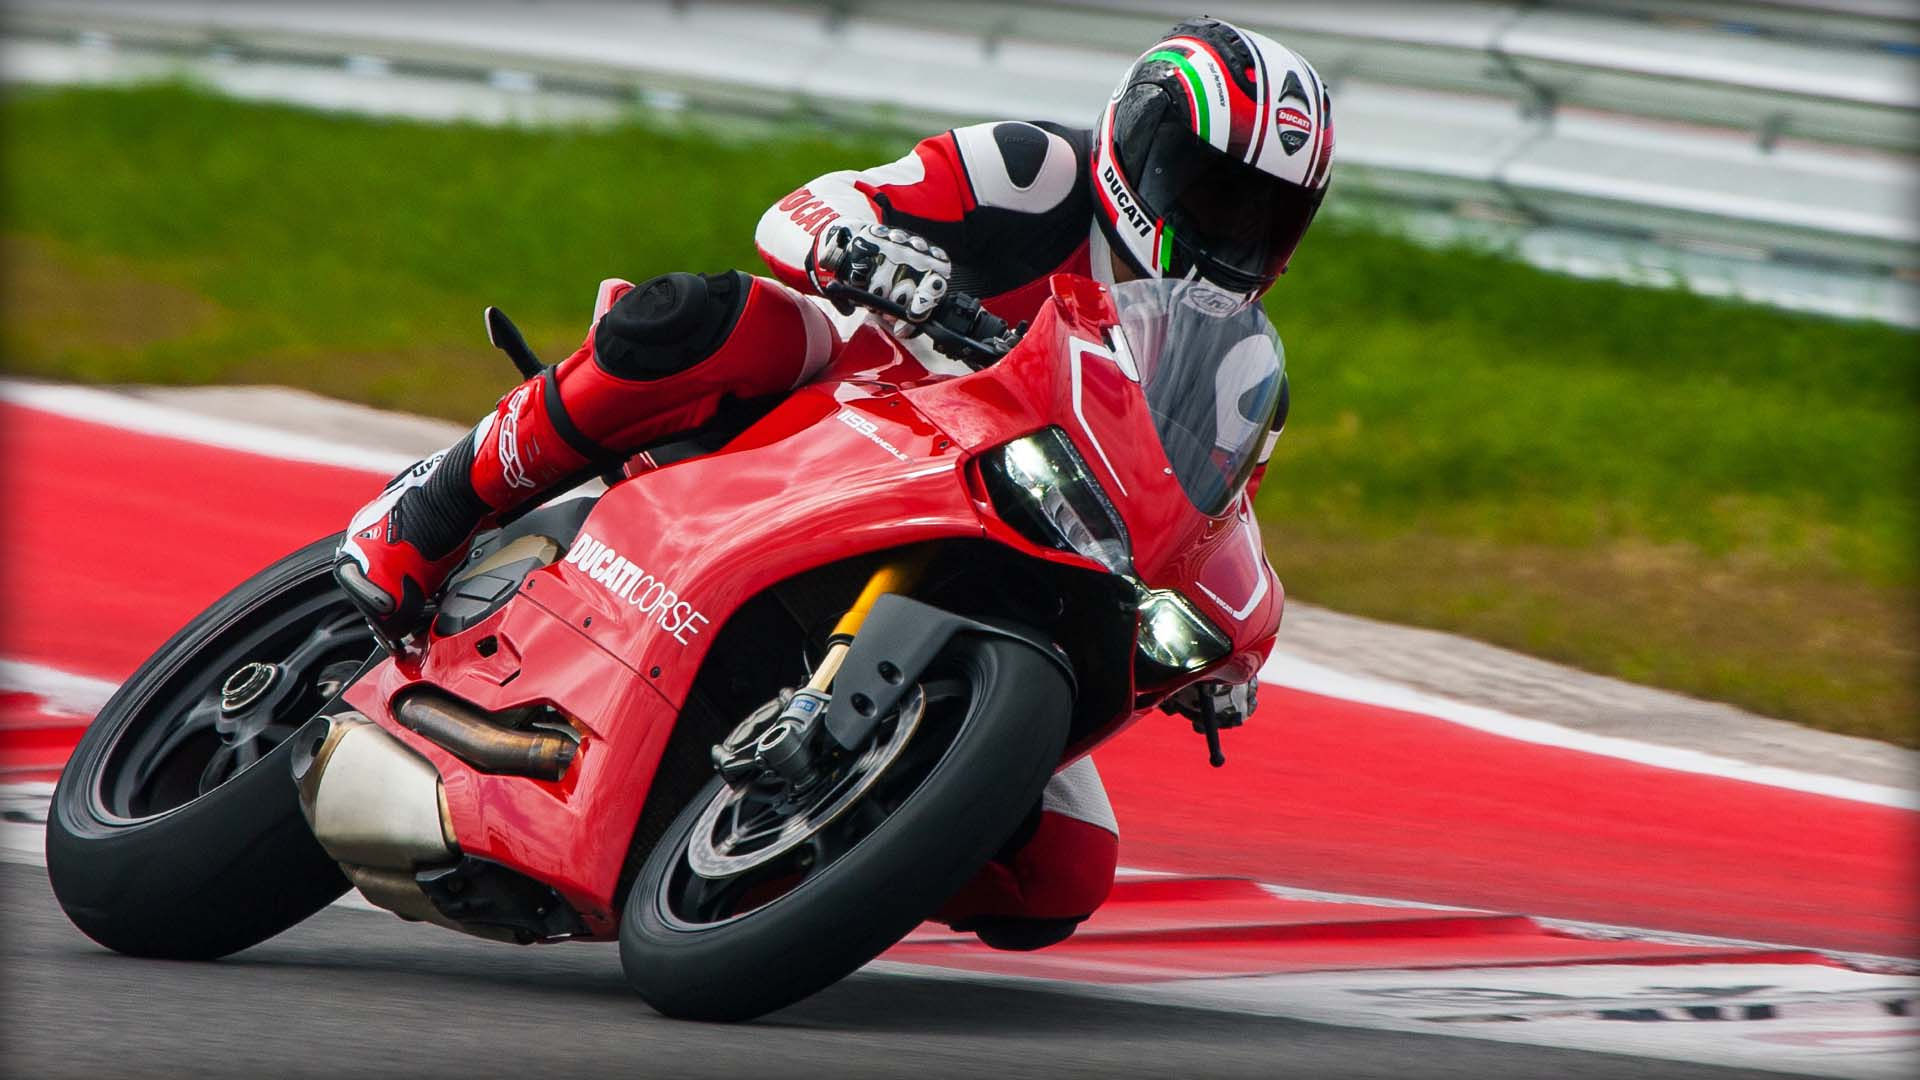 2014 Ducati  | Ducati 1199 Panigale R - Apex